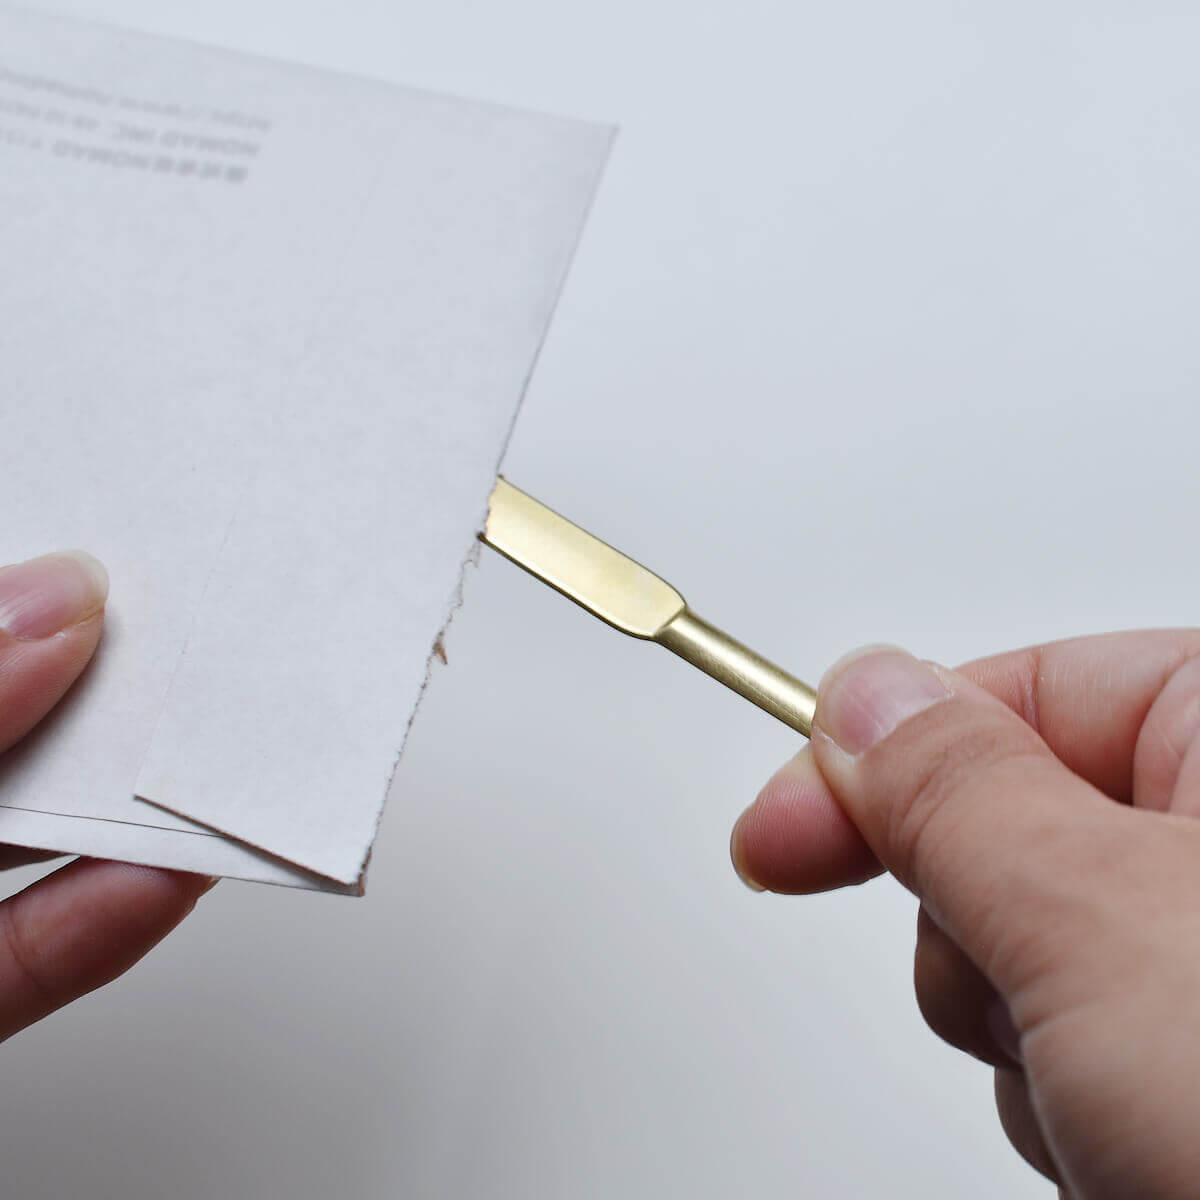 BRASS PAPER KNIFE